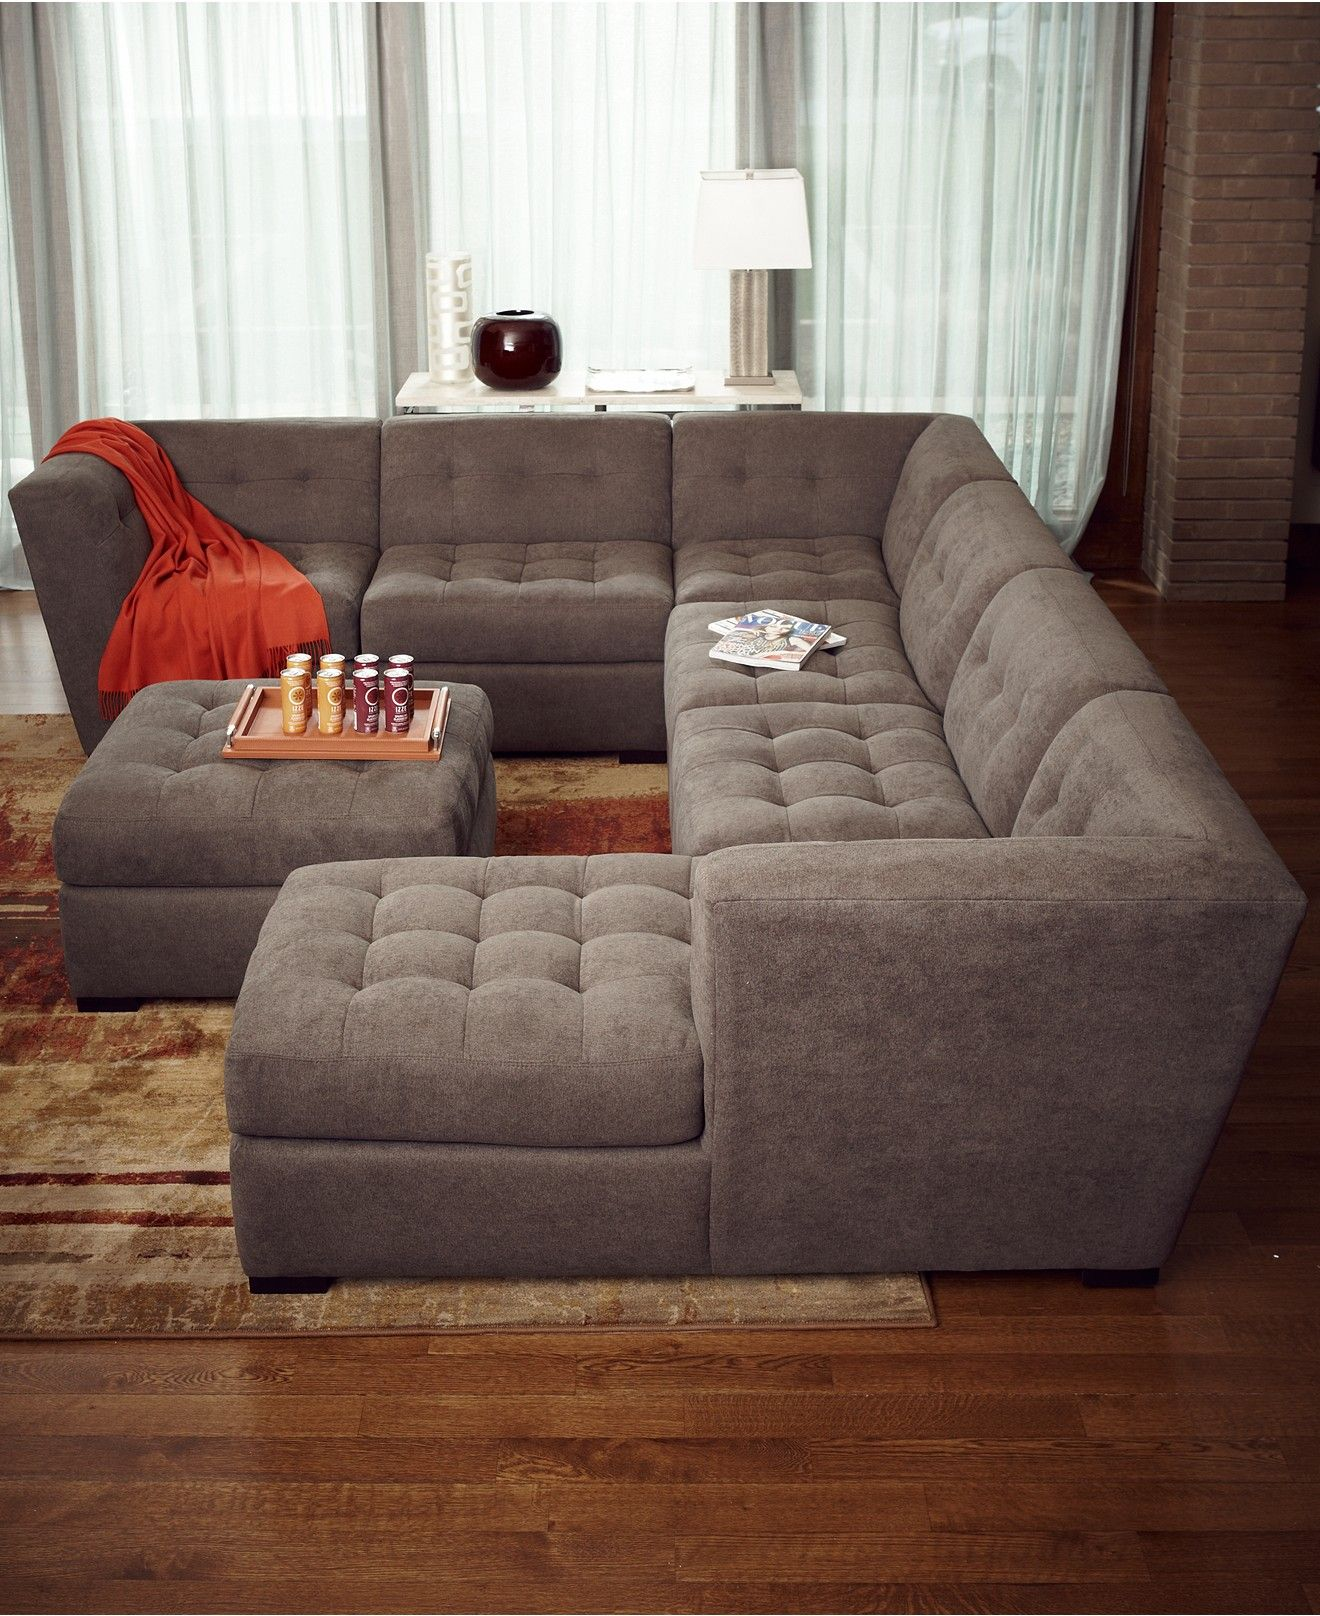 Peachy Roxanne Fabric 6 Piece Modular Sectional Sofa Corner Unit Machost Co Dining Chair Design Ideas Machostcouk